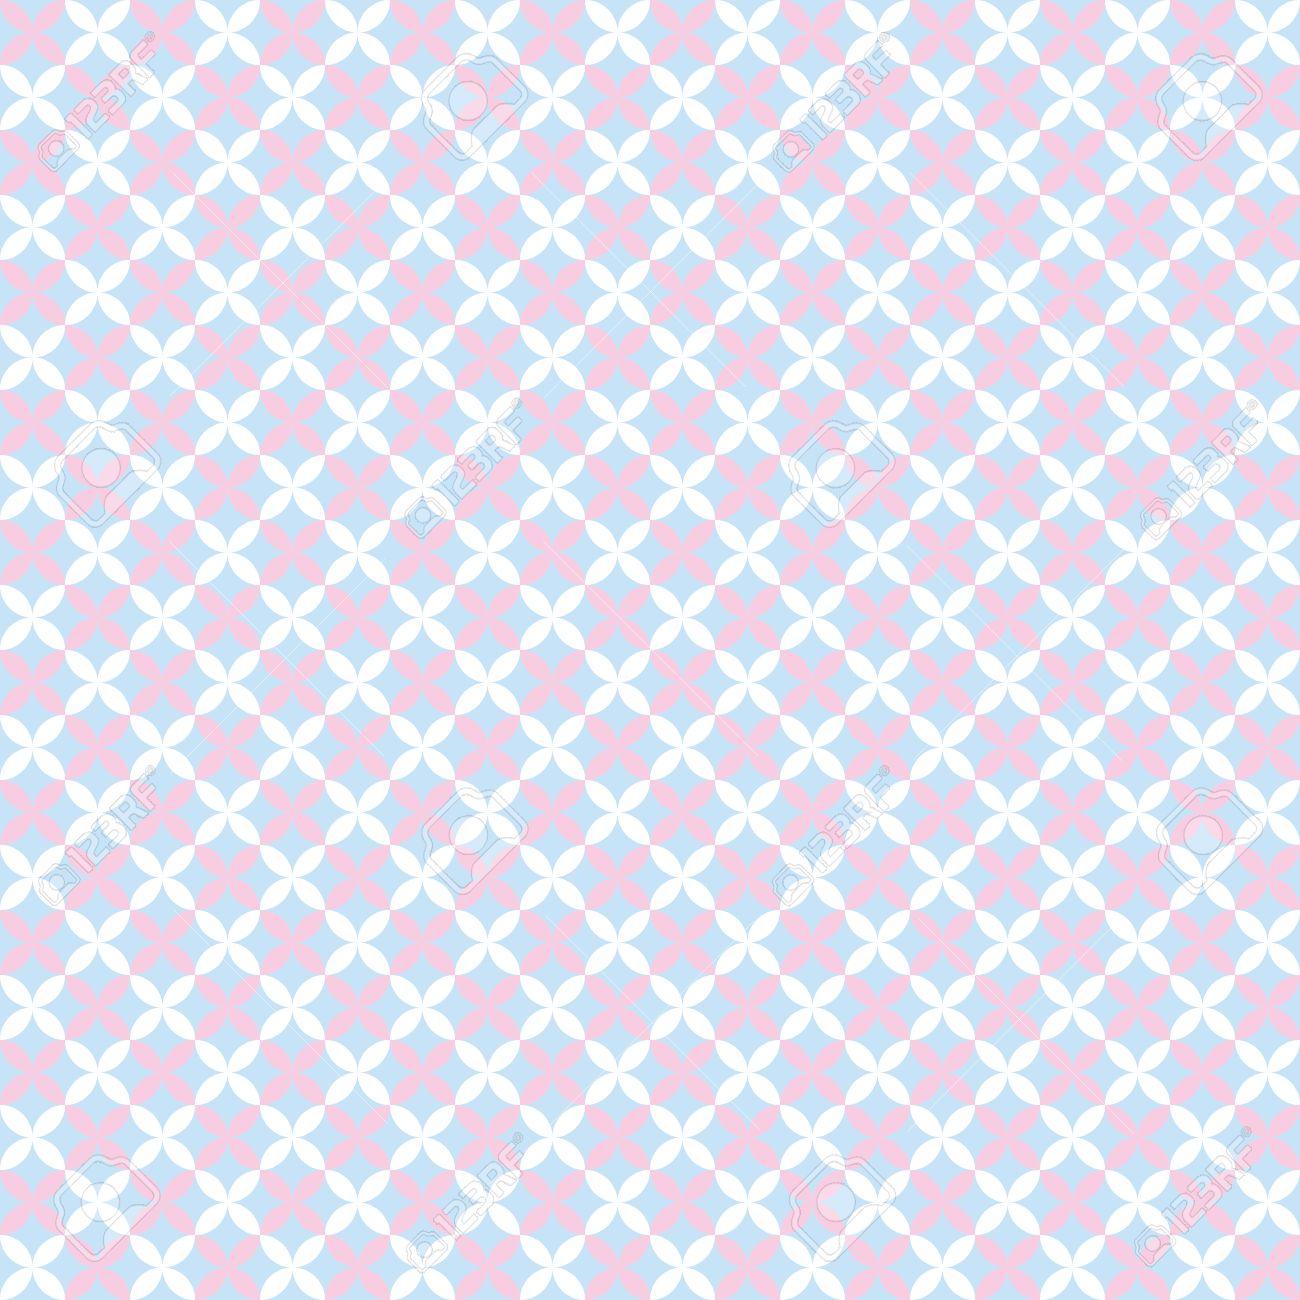 Carta Da Parati Bambini Texture.Vettoriale Bambino Pastello Diverso Vector Seamless Piastrelle